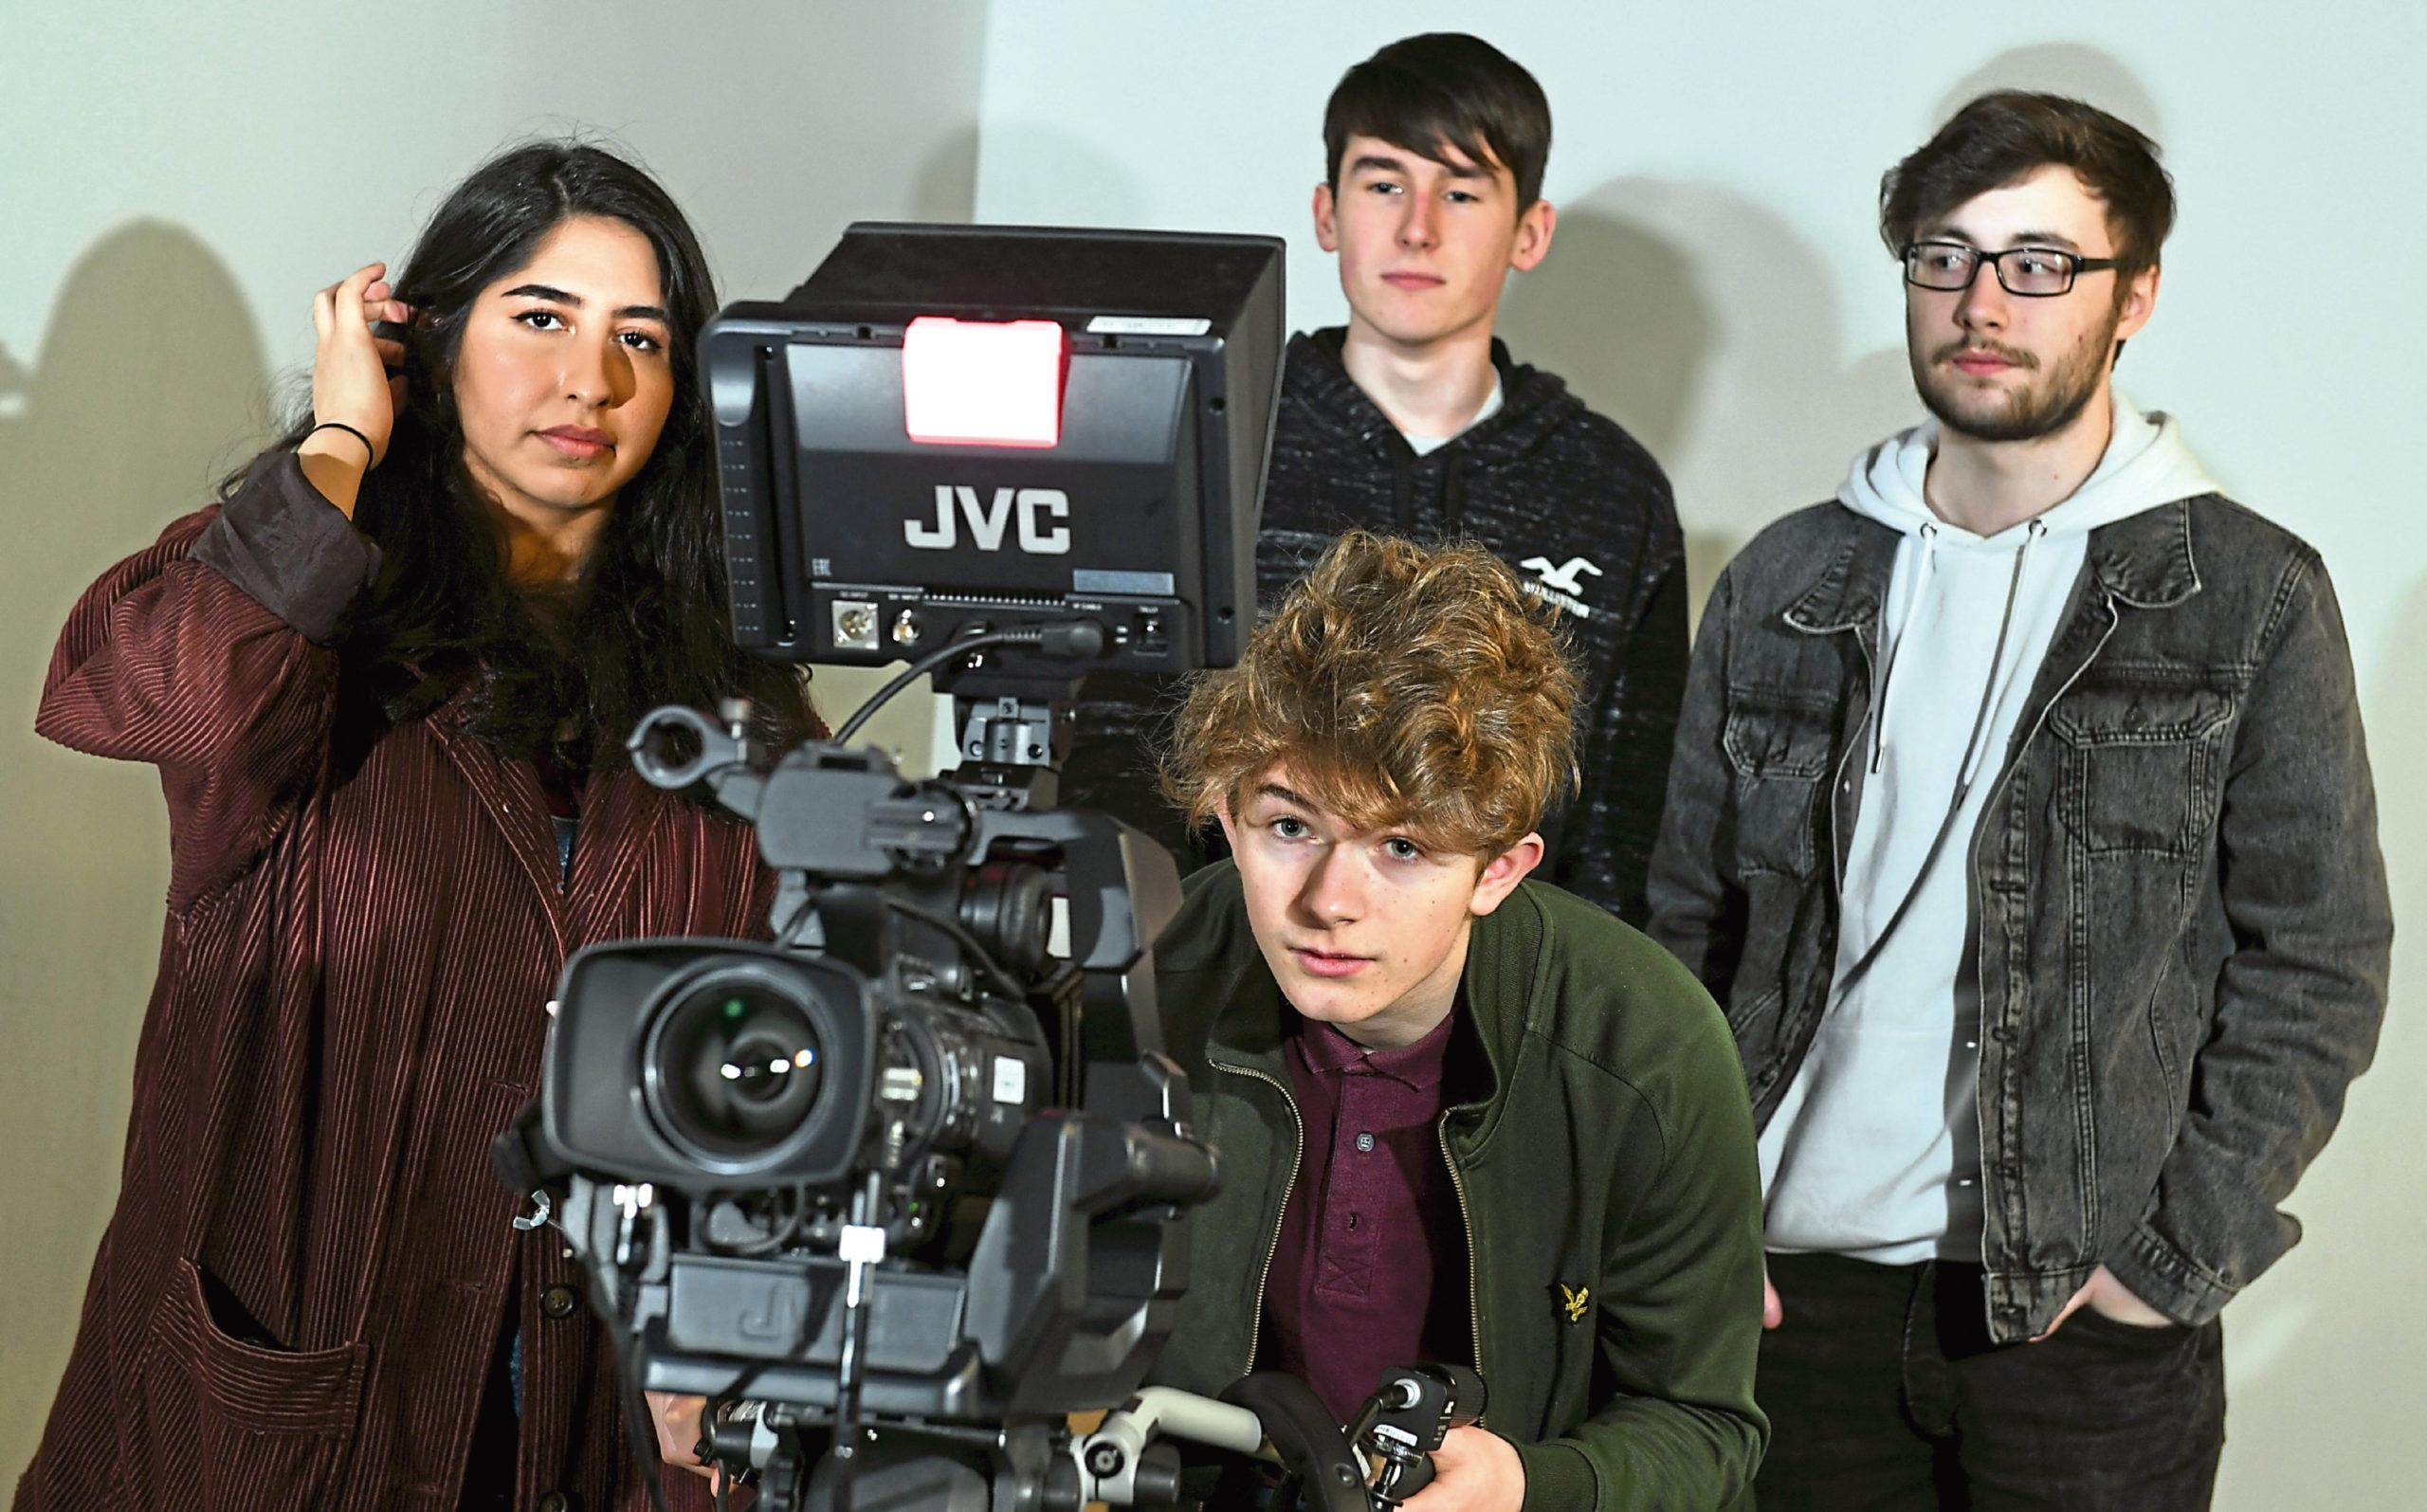 Media students Niloufar Momtz, Cameron Main, Ben Morley and Angus Brooks